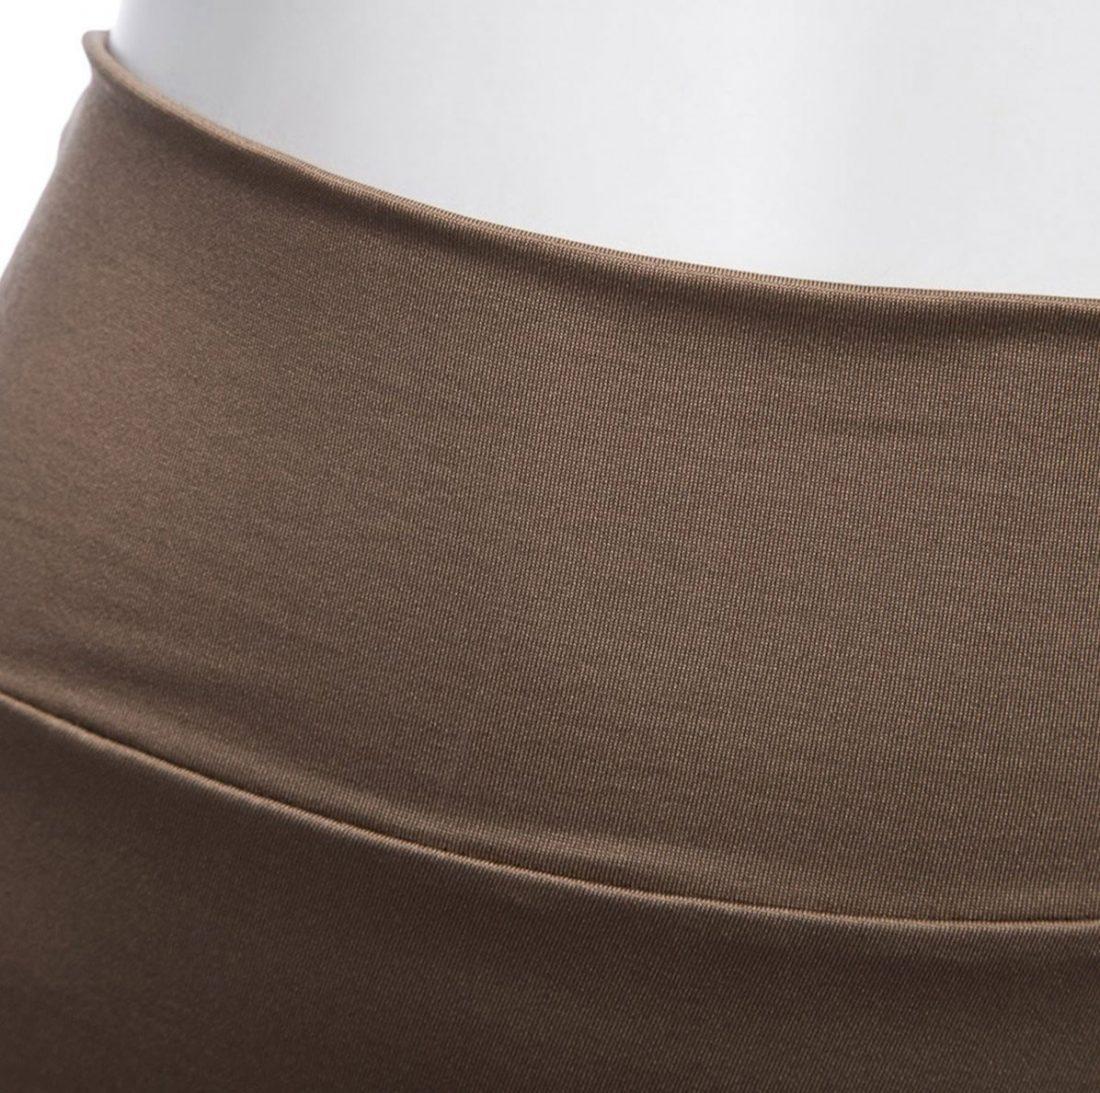 M0182 khaki5 Side Split Skirts maureens.com boutique